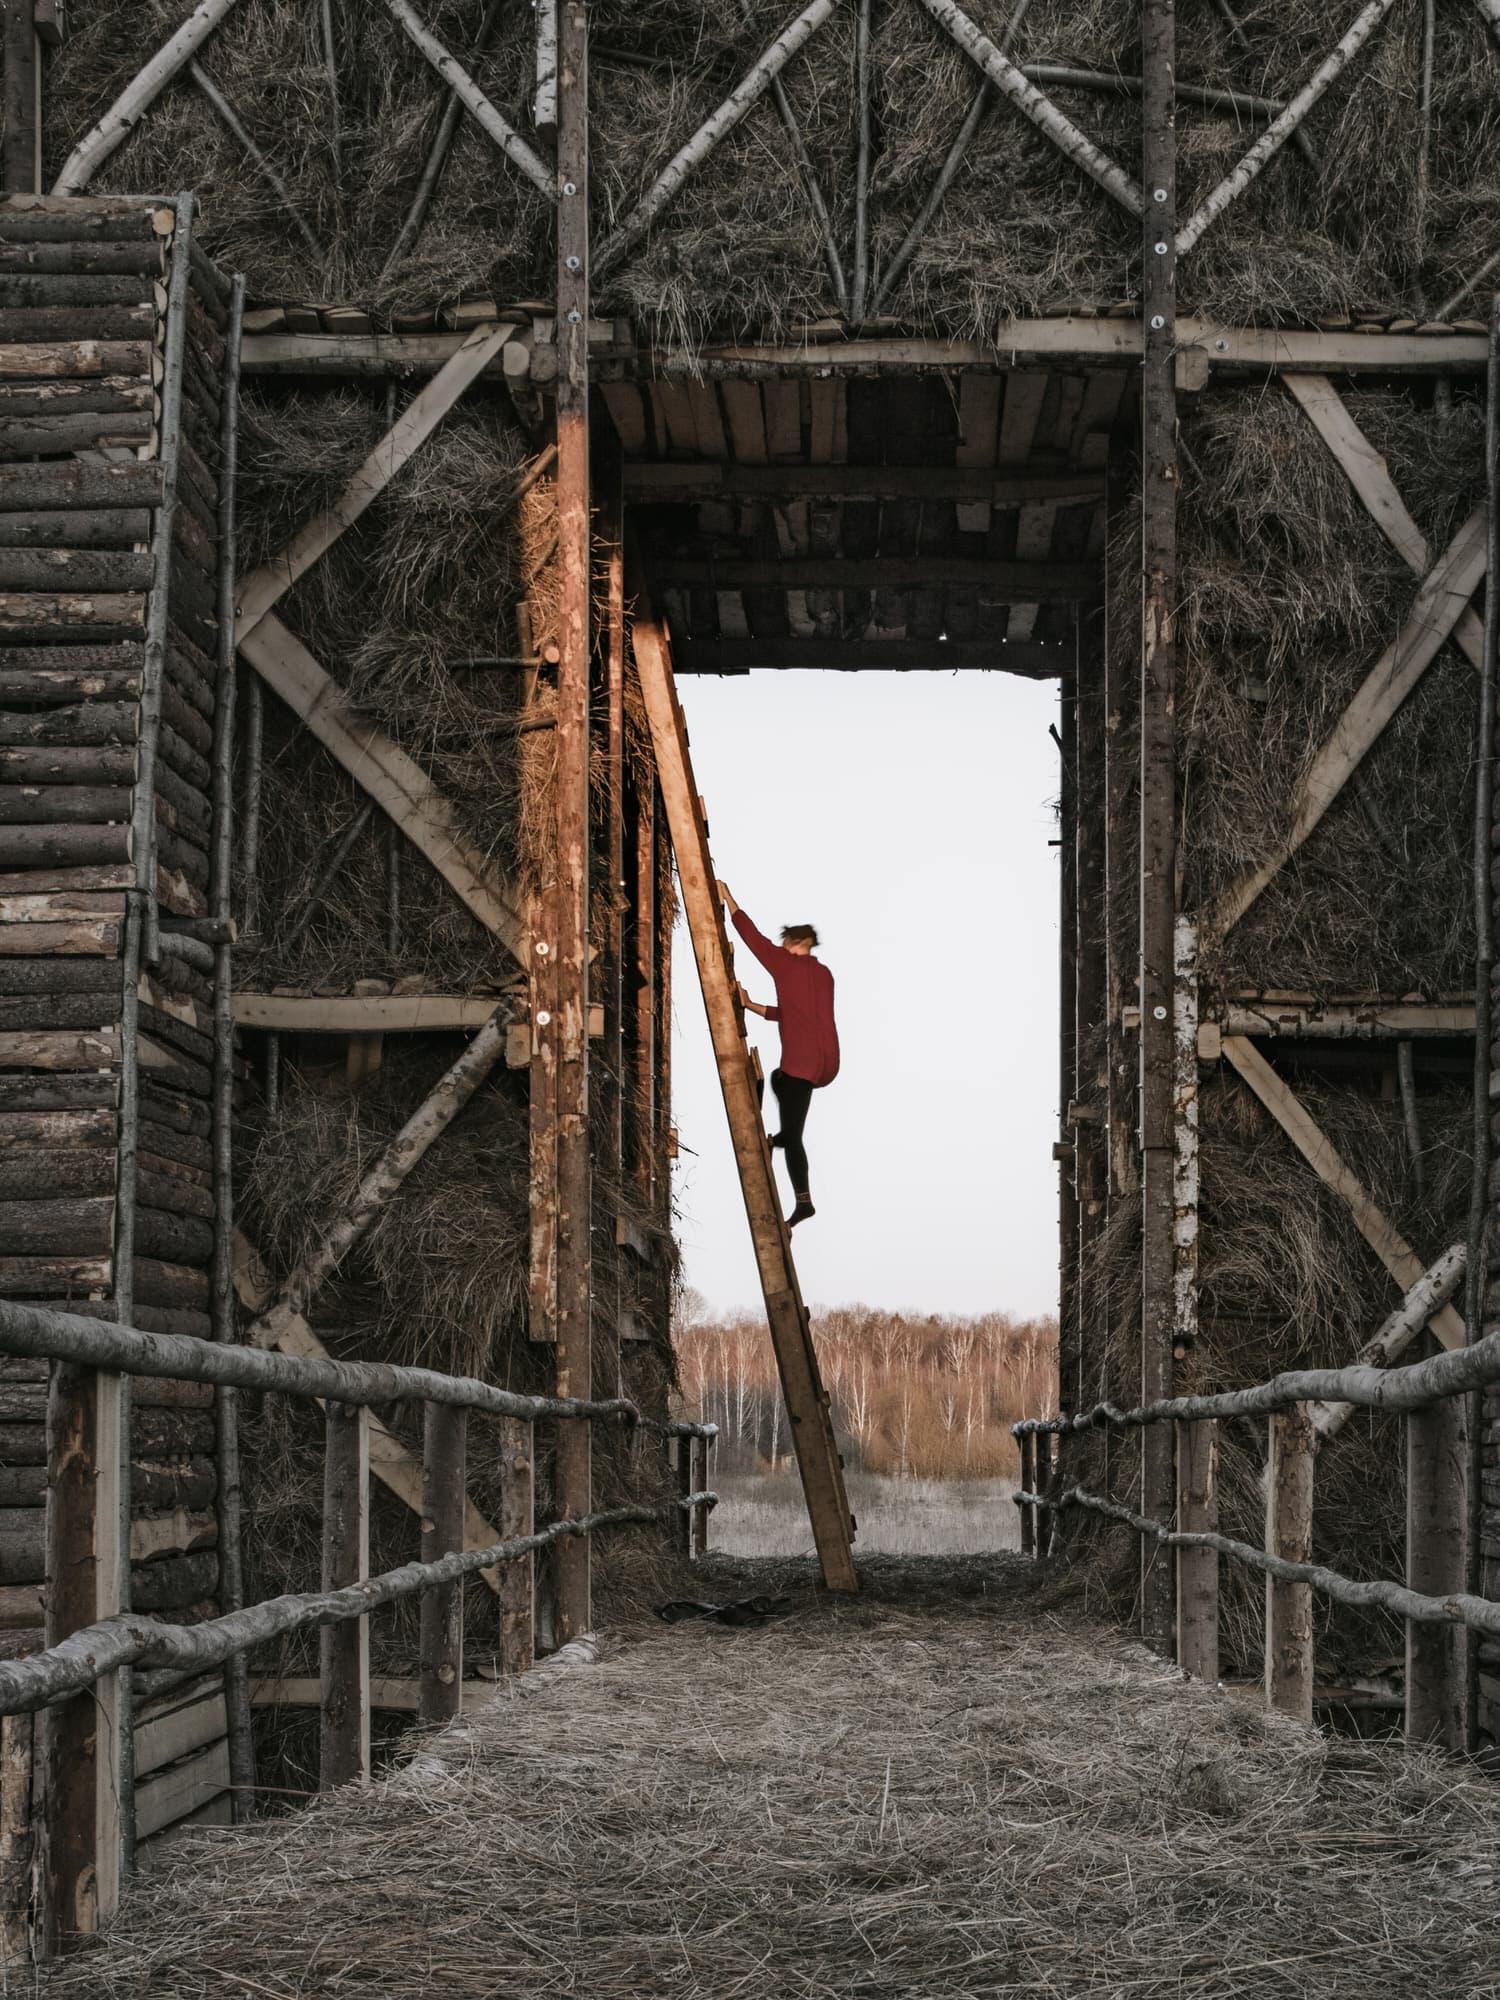 Katarsis, Burning Bridges Installation in Russia, Photo Grigoriy Sokolinsky   Yellowtrace